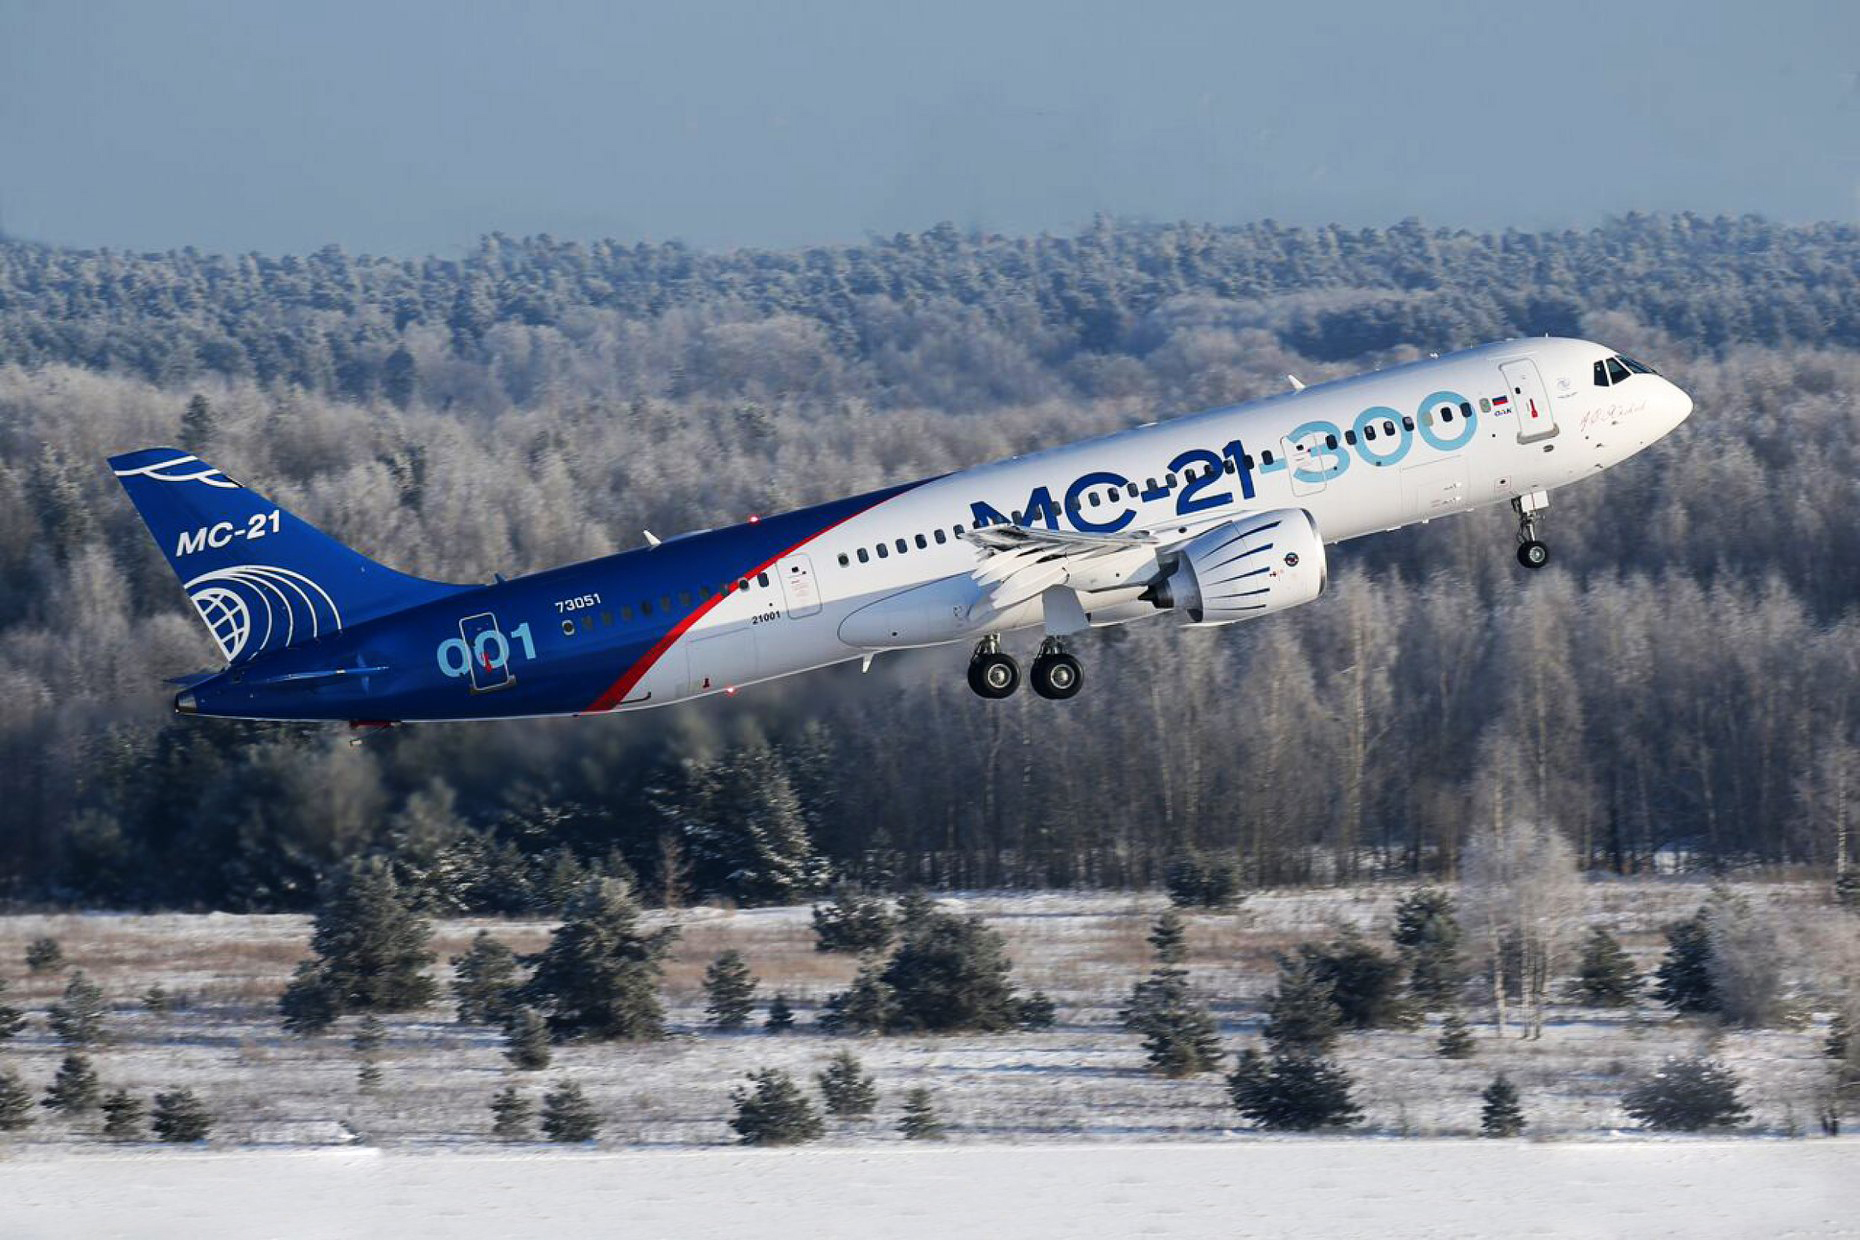 MC-21-300 em voo